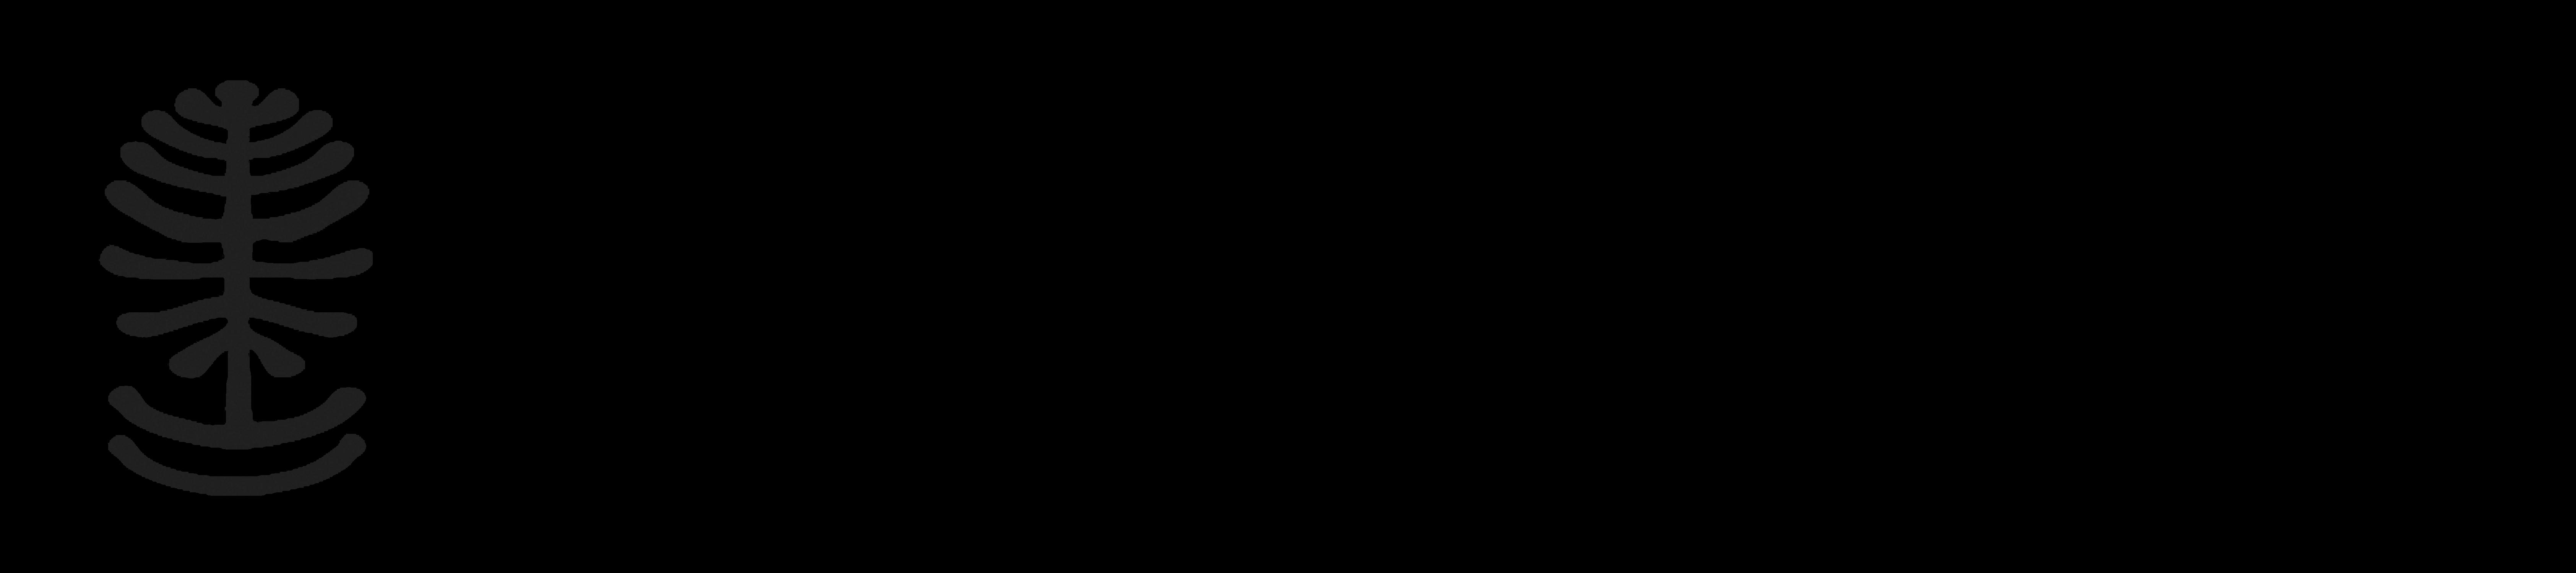 woodfordia logo long